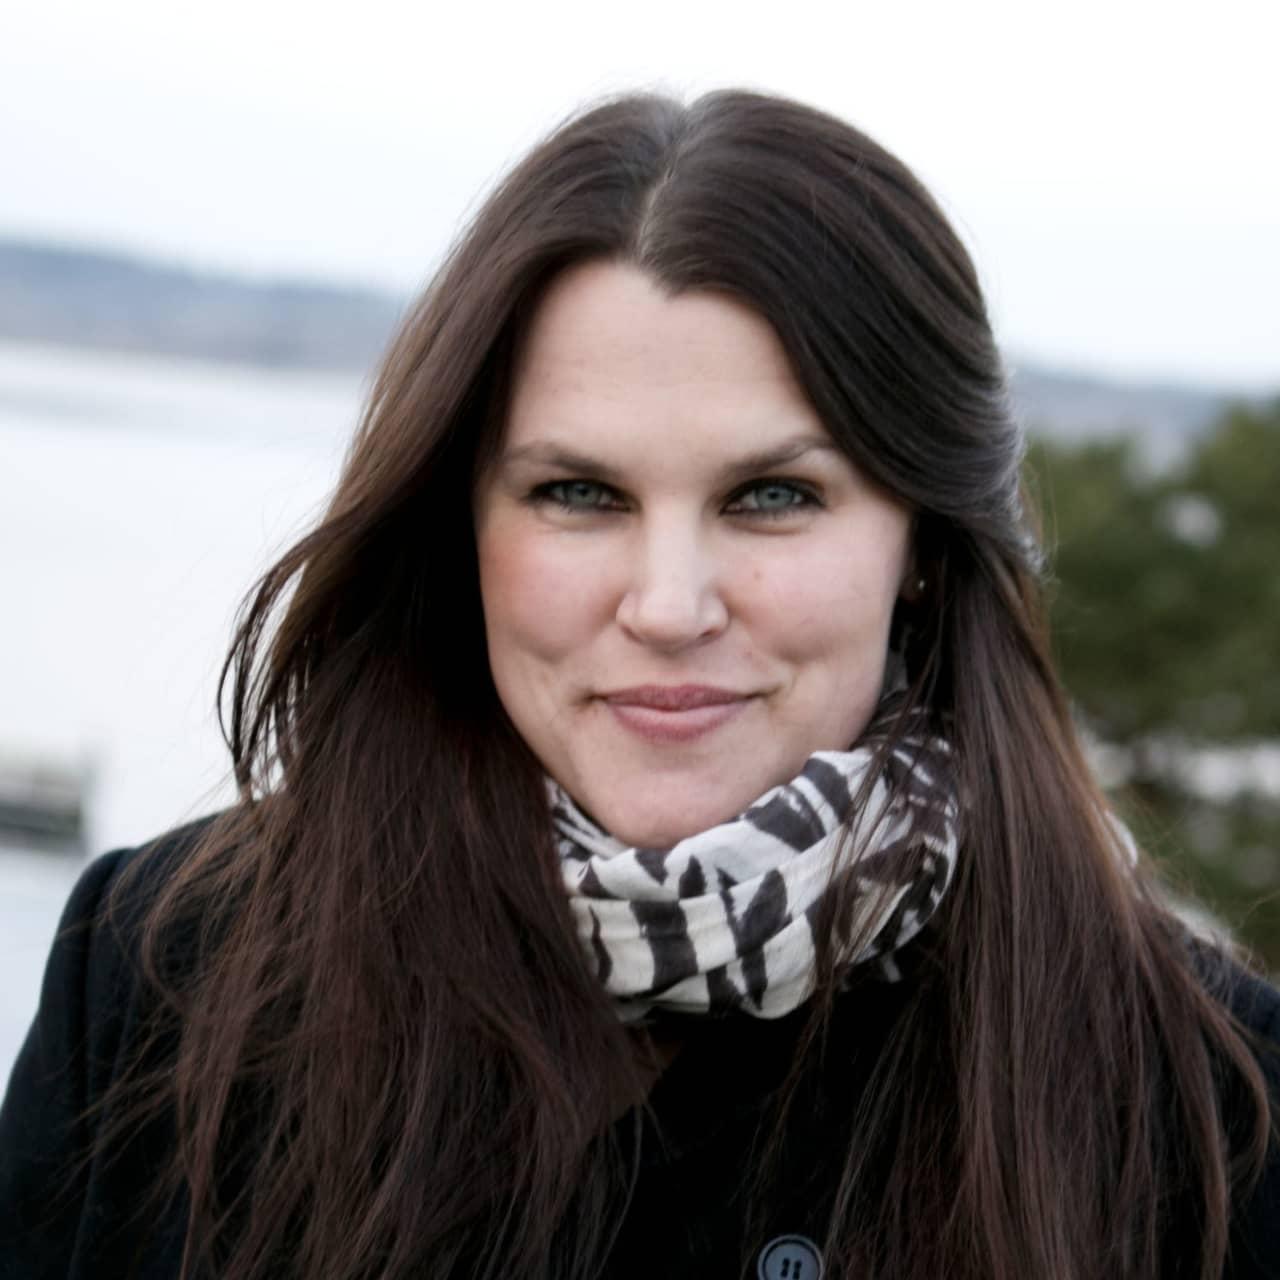 3. Mia Skäringer Lázár